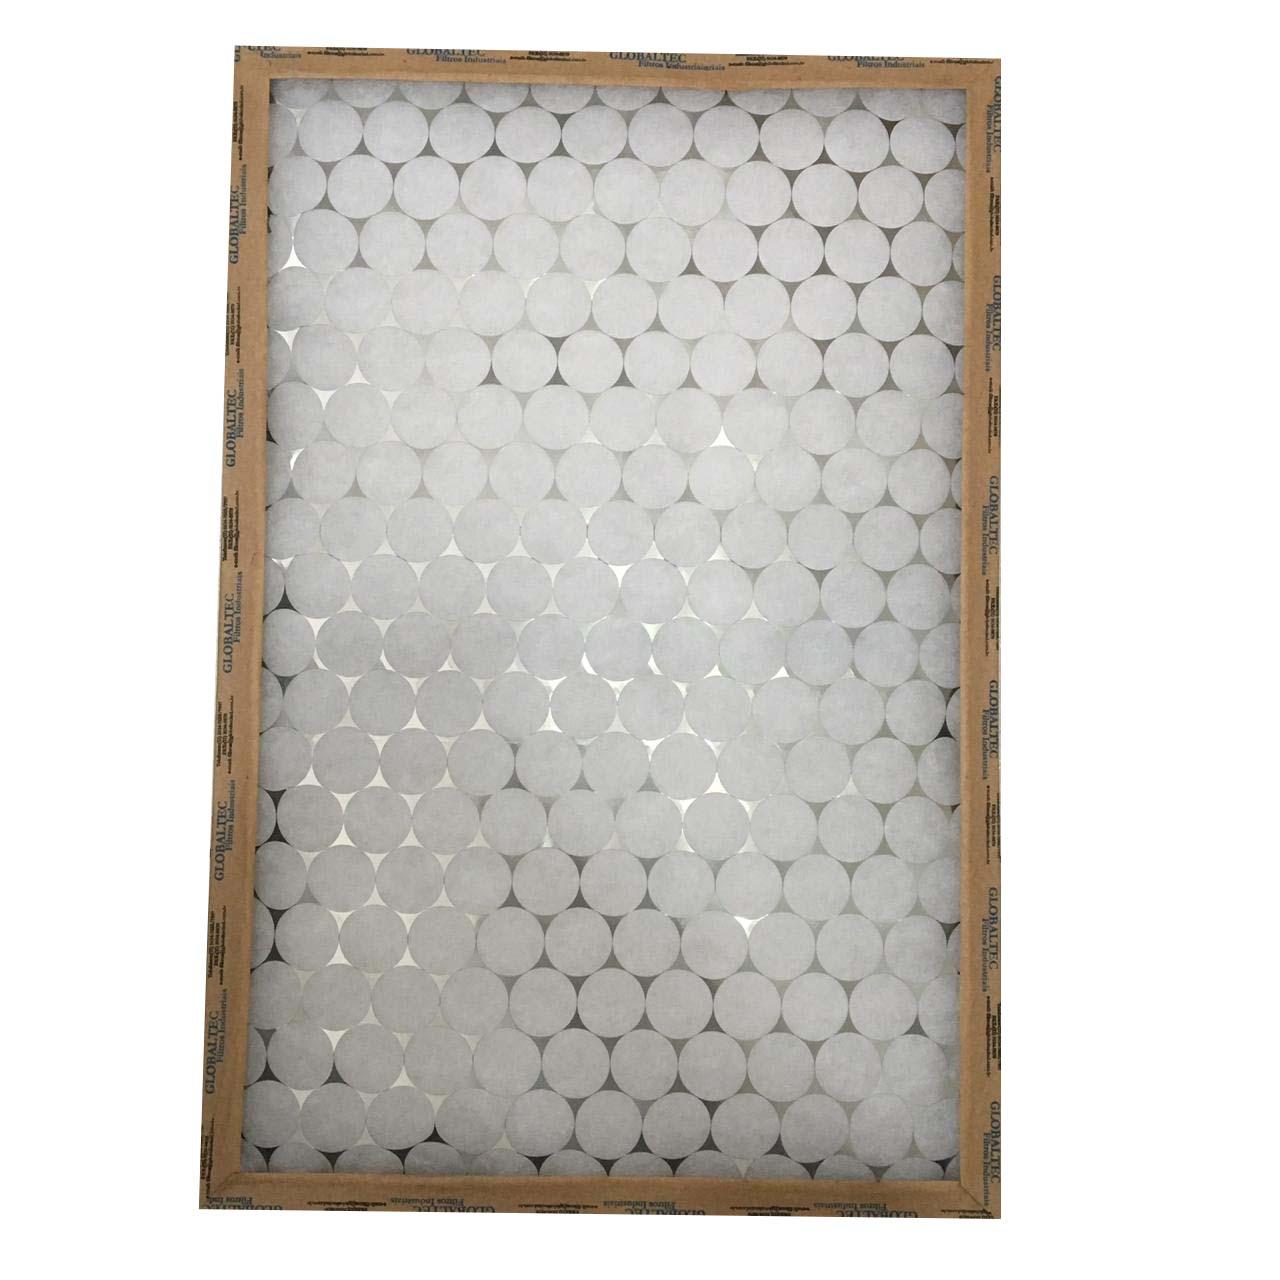 Filtro de Ar Condicionado G4 Hitachi HLC9815B